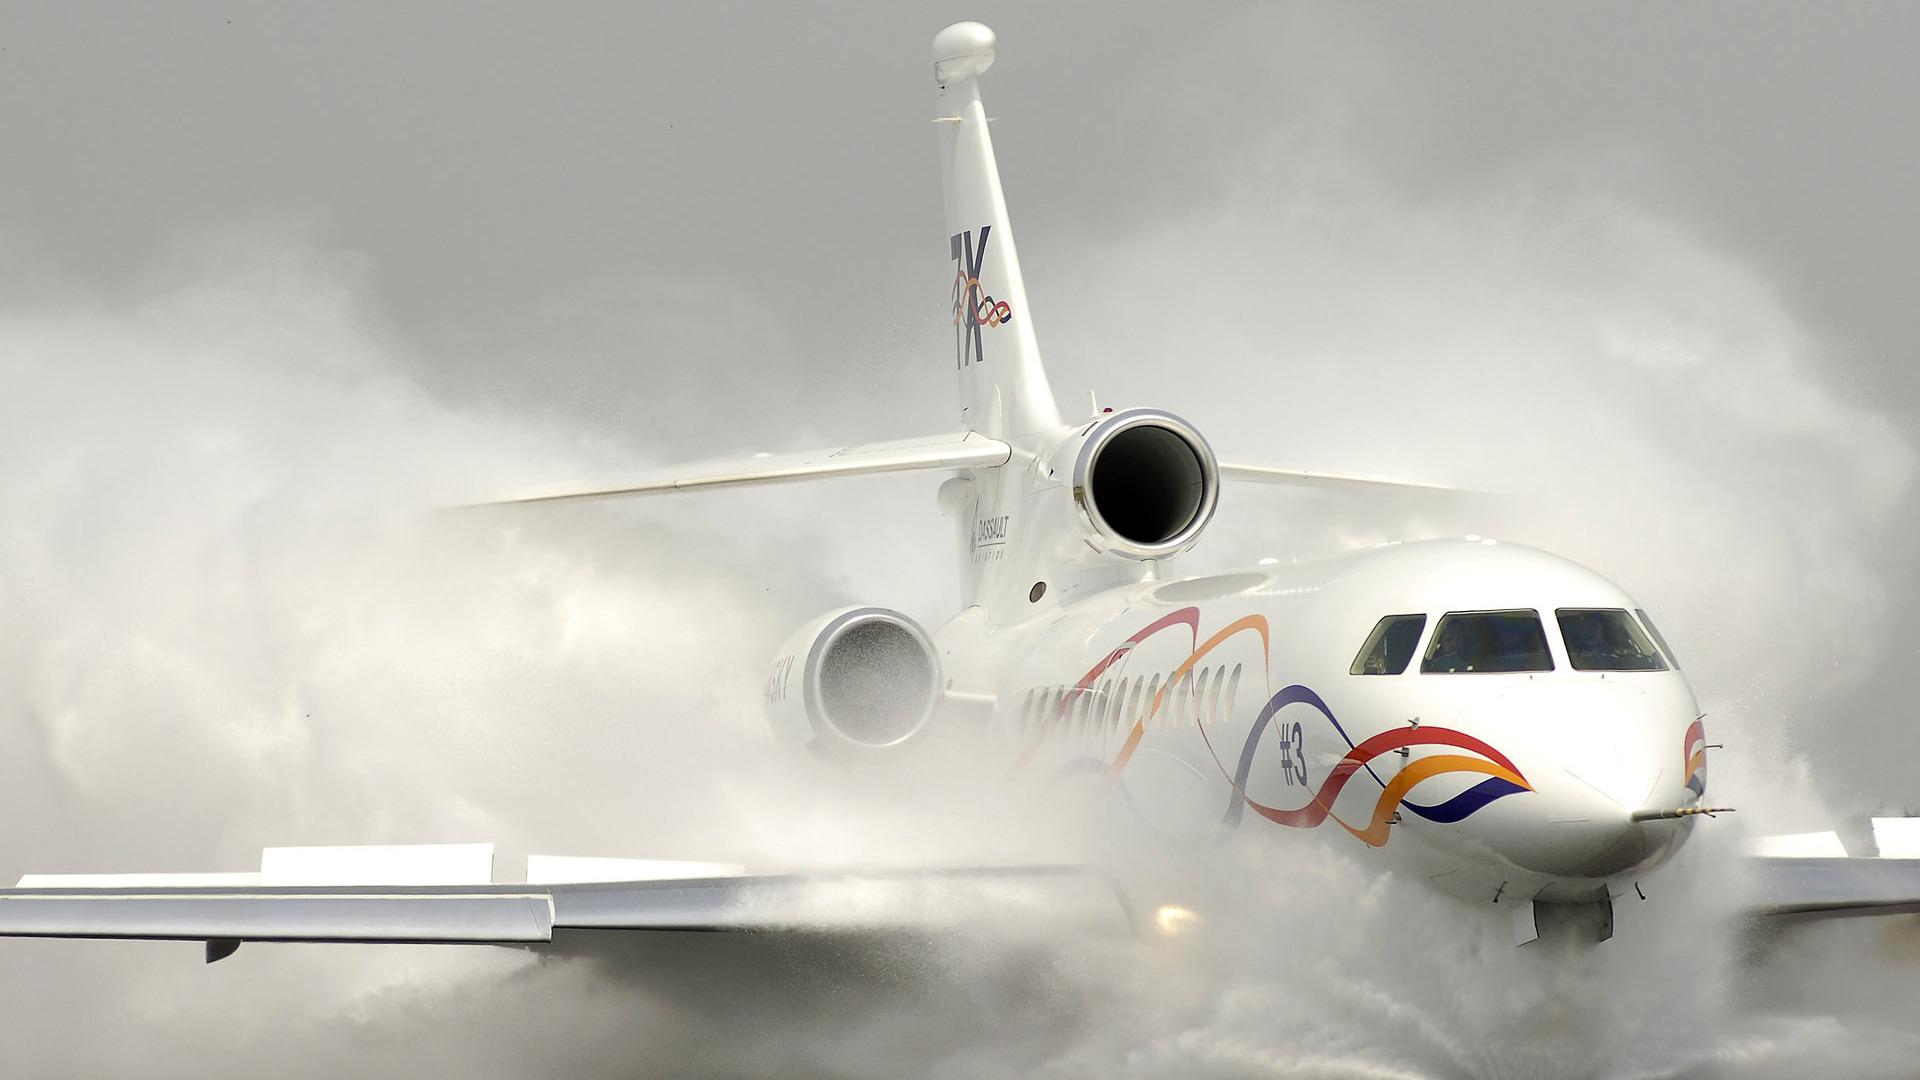 Aviation Wallpaper HD